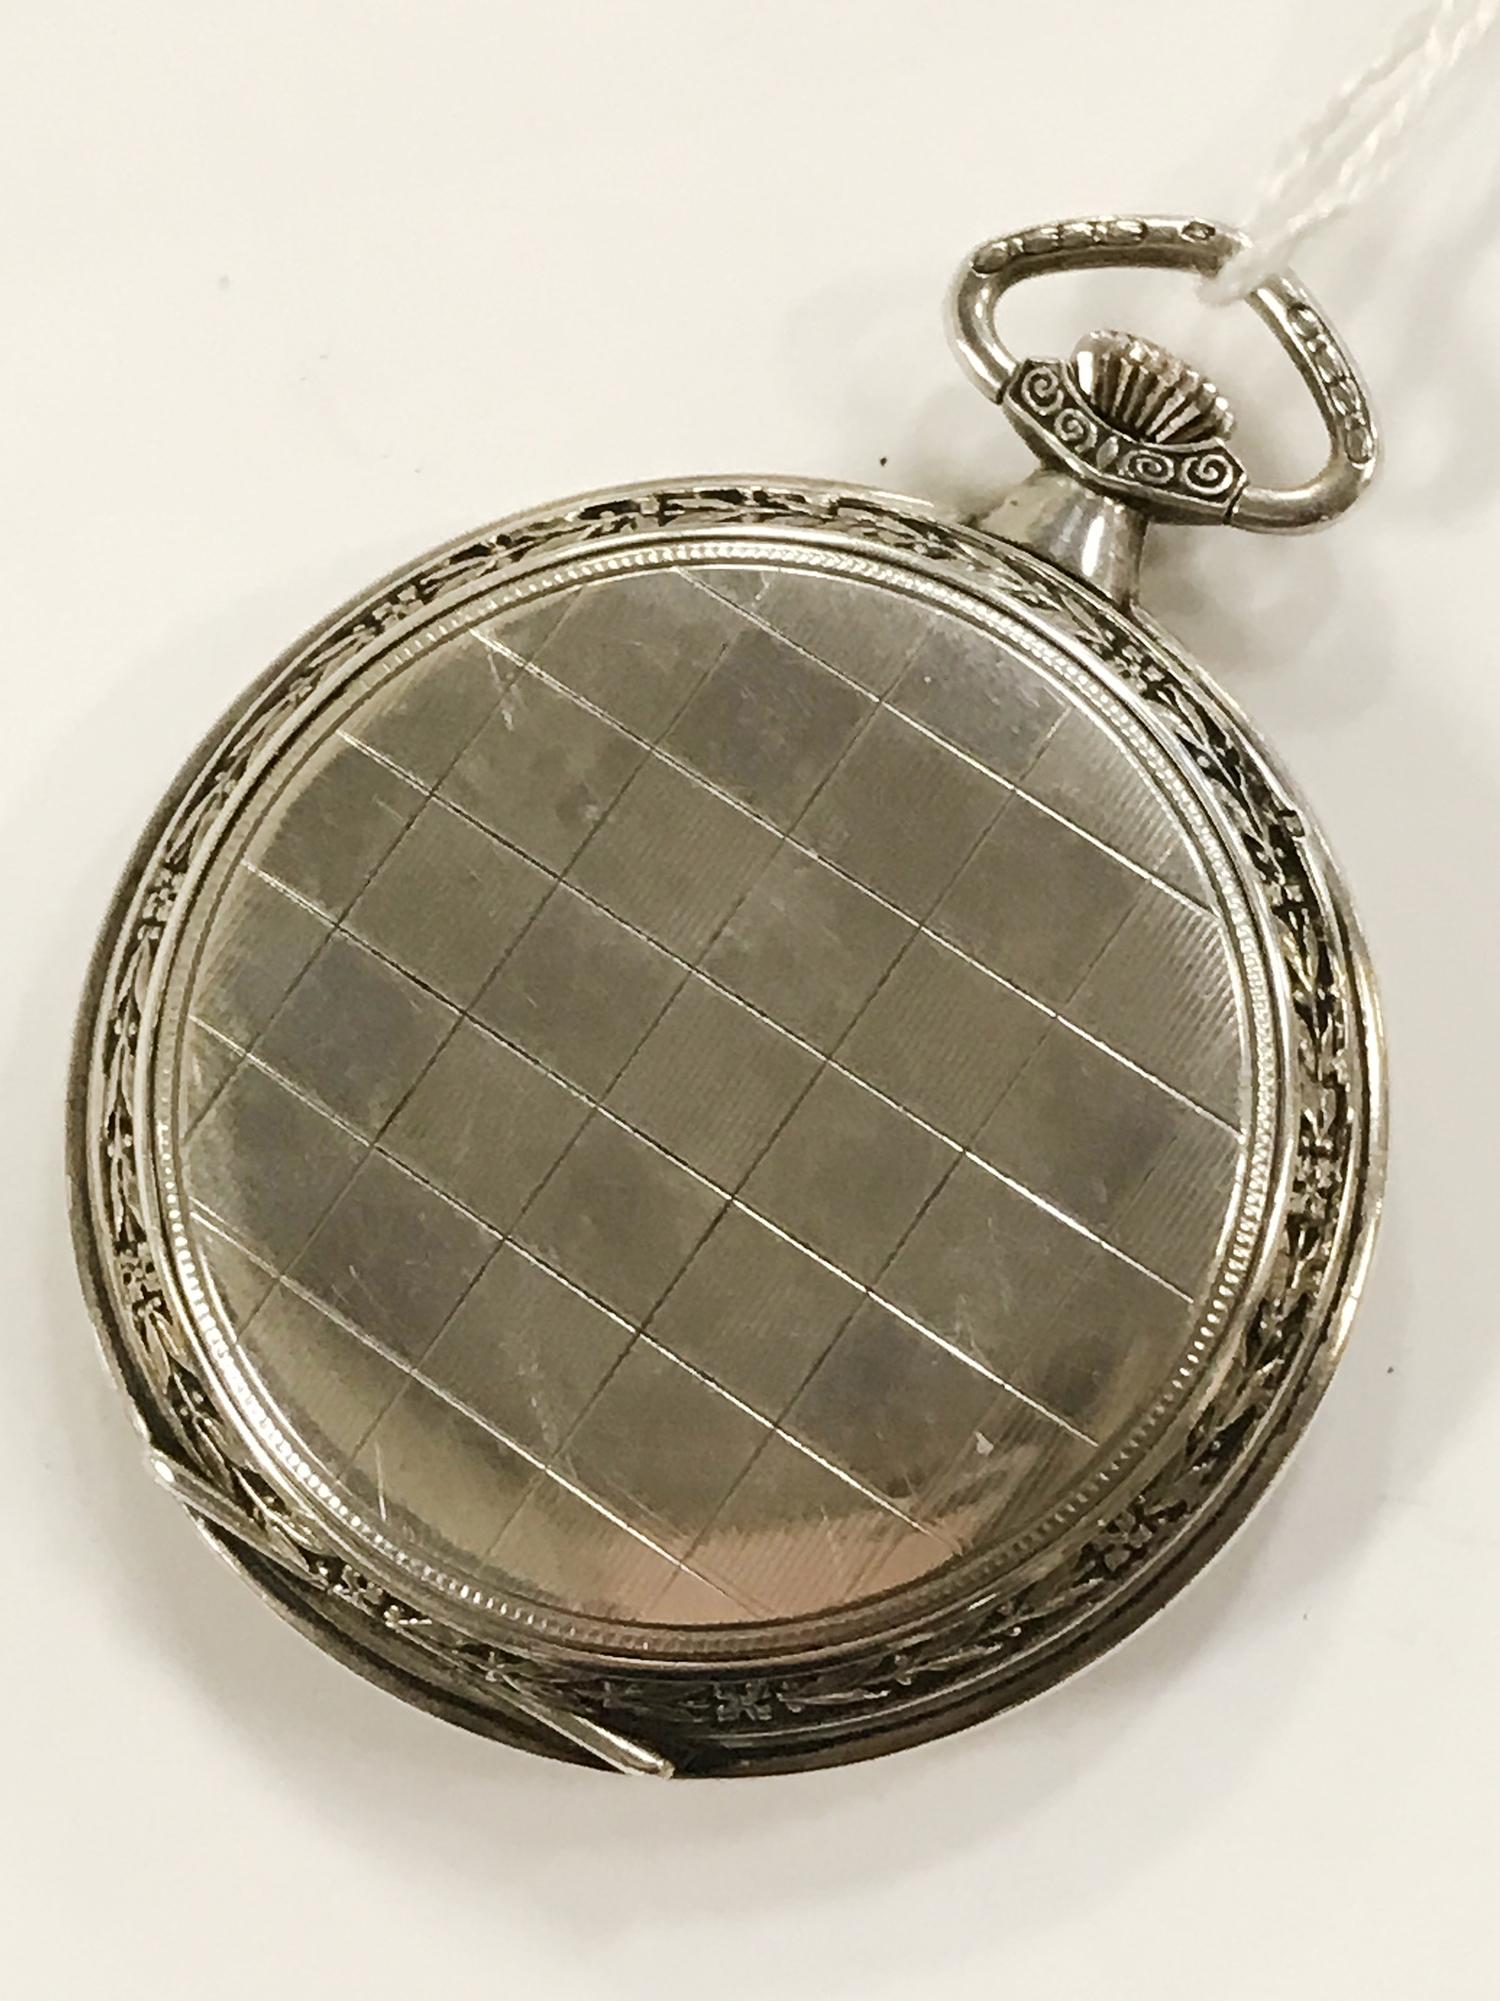 CORGEMONT CHRONOMETER POCKET WATCH - Image 4 of 7